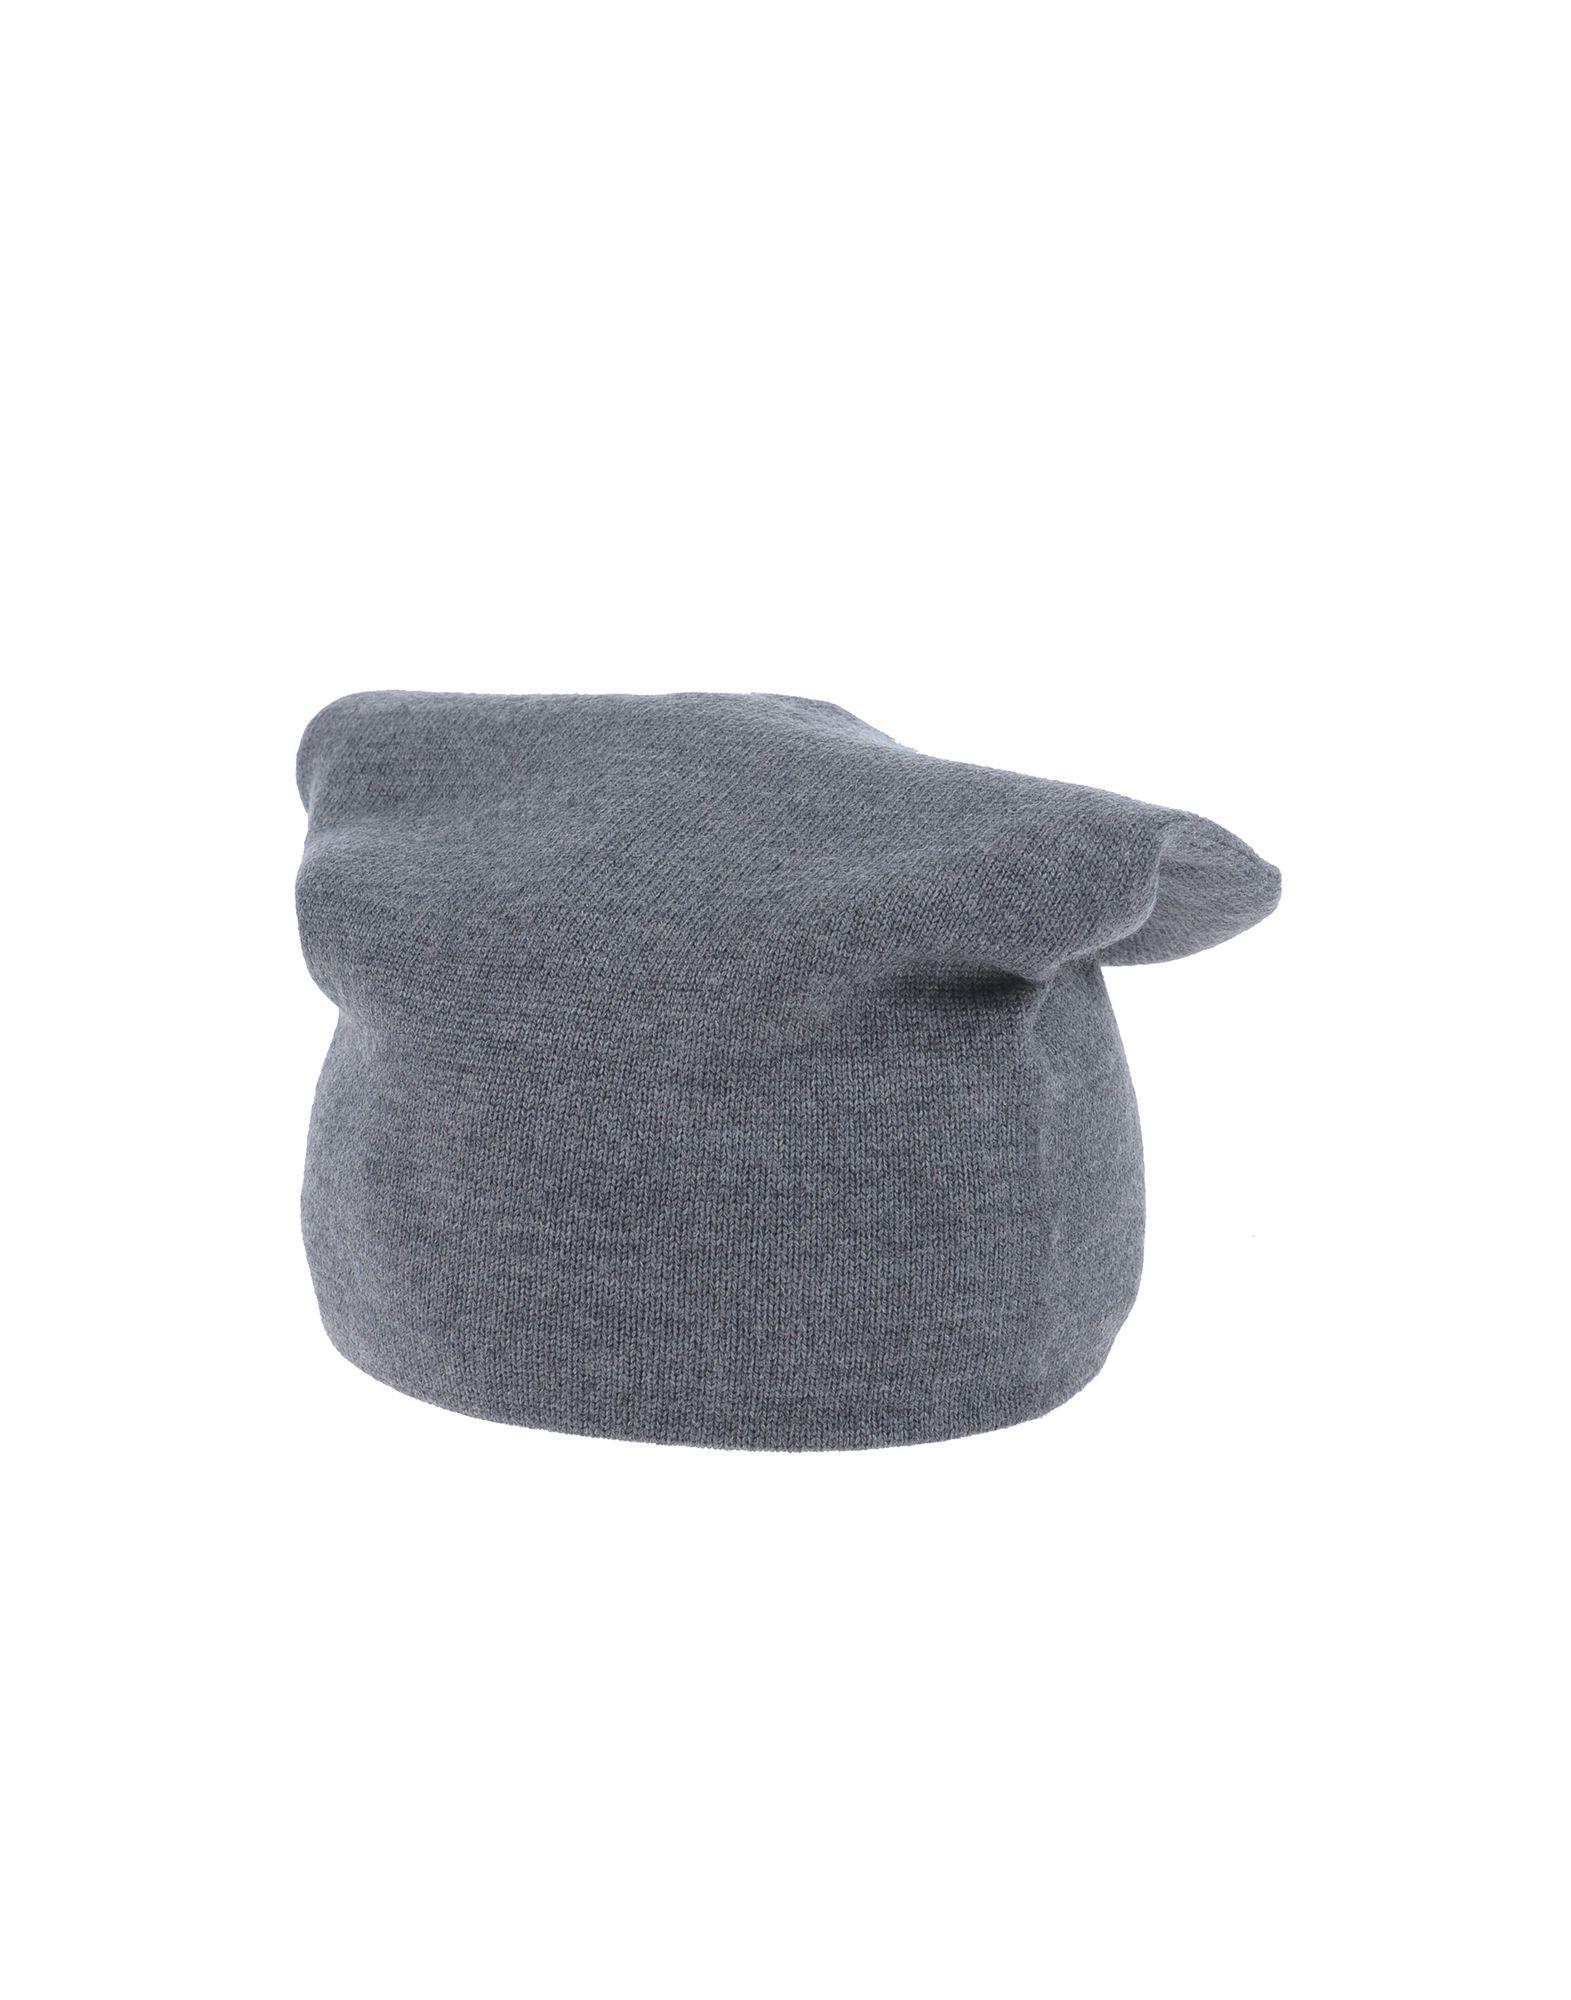 ALEXANDER WANG Damen Mützen & Hüte Farbe Grau Größe 1